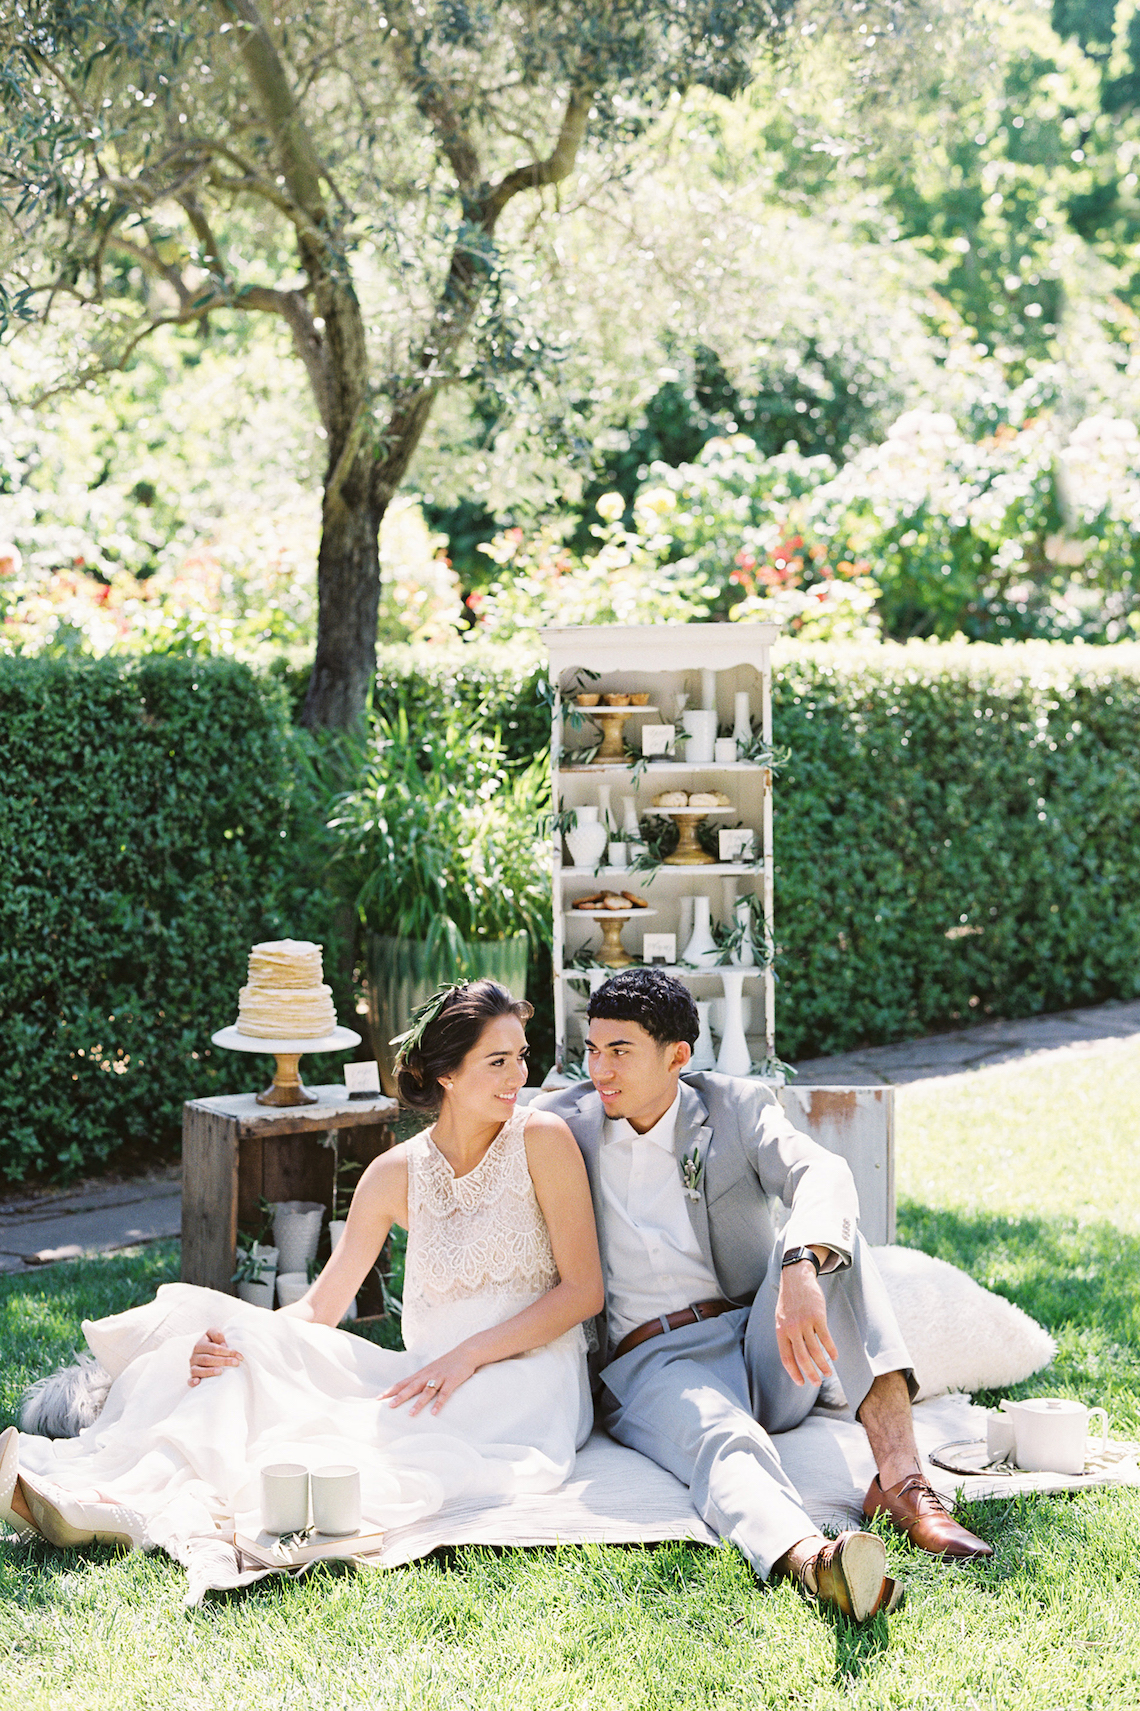 Vintage Lace; Pretty Wedding Ideas Featuring A Crepe Cake & Lamb's Ear Bouquet   Nathalie Cheng 28